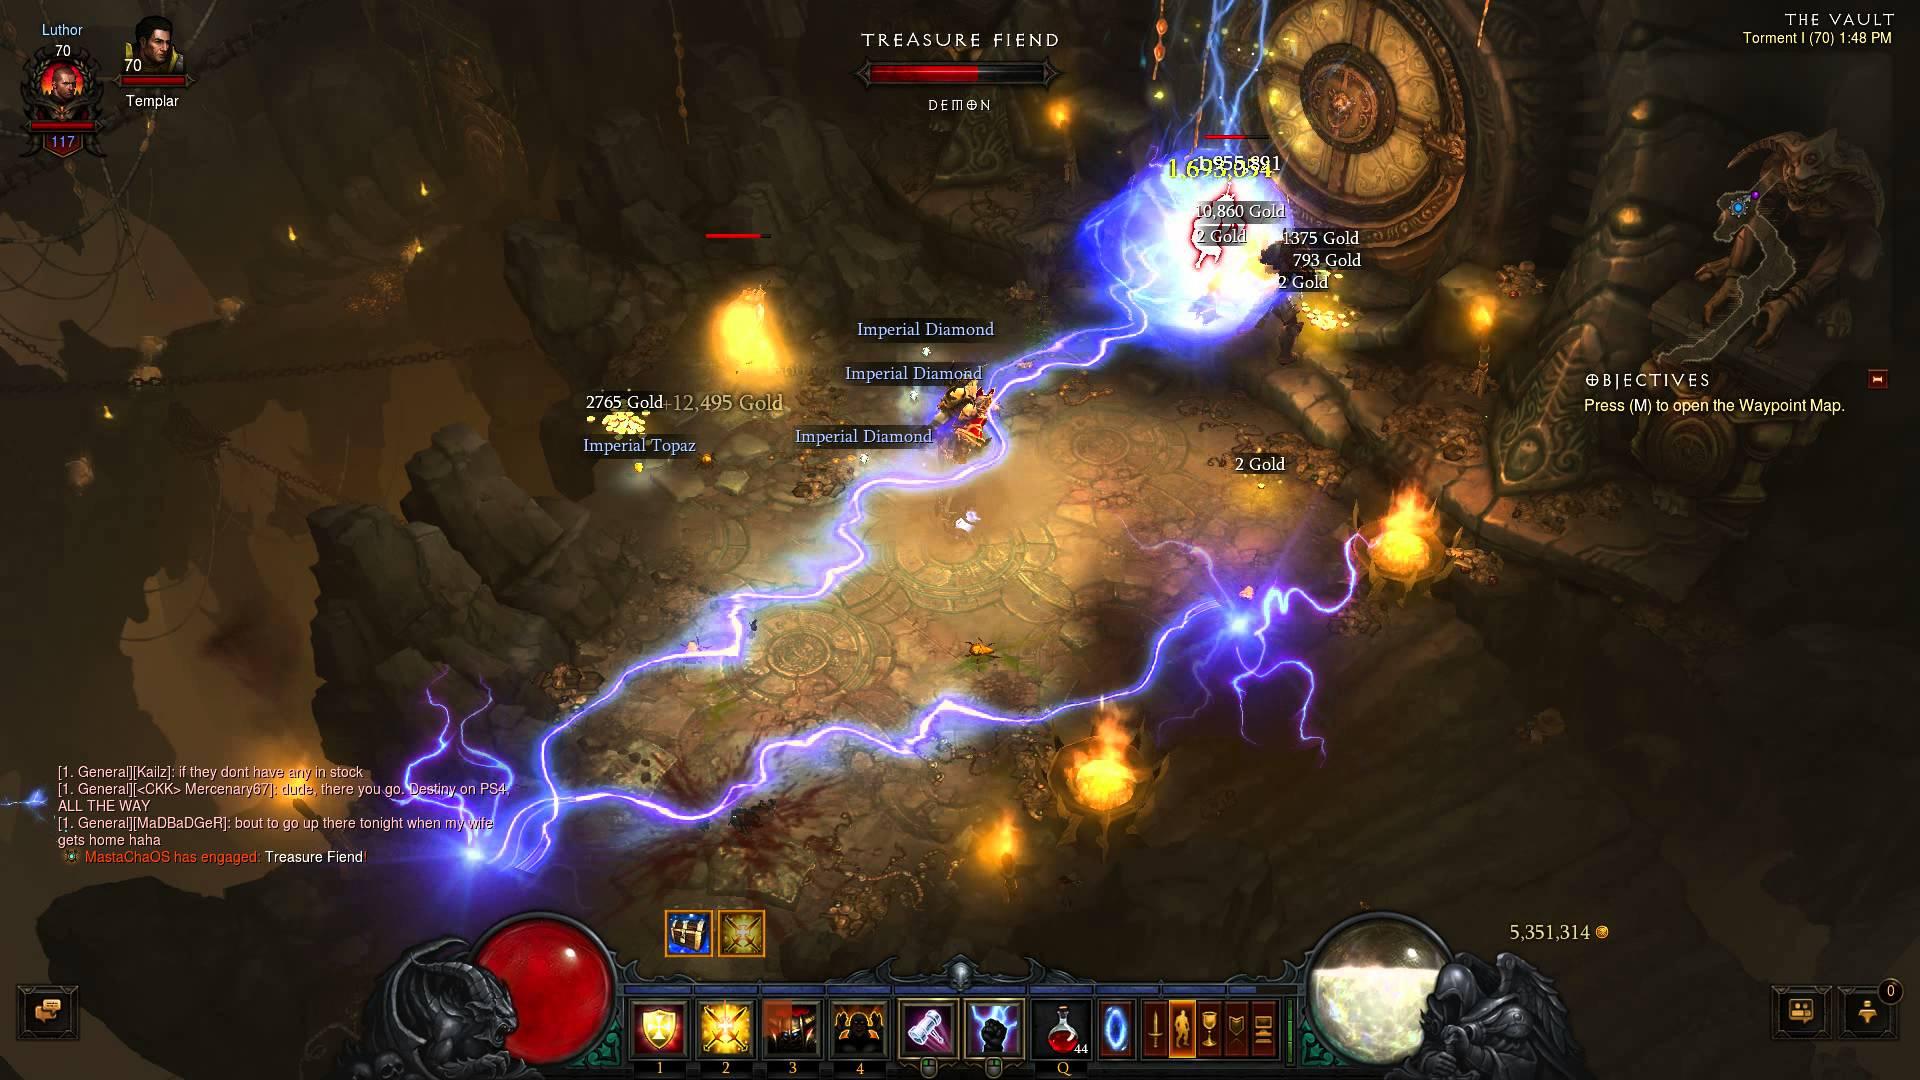 Diablo III – Greed's Treasure Realm